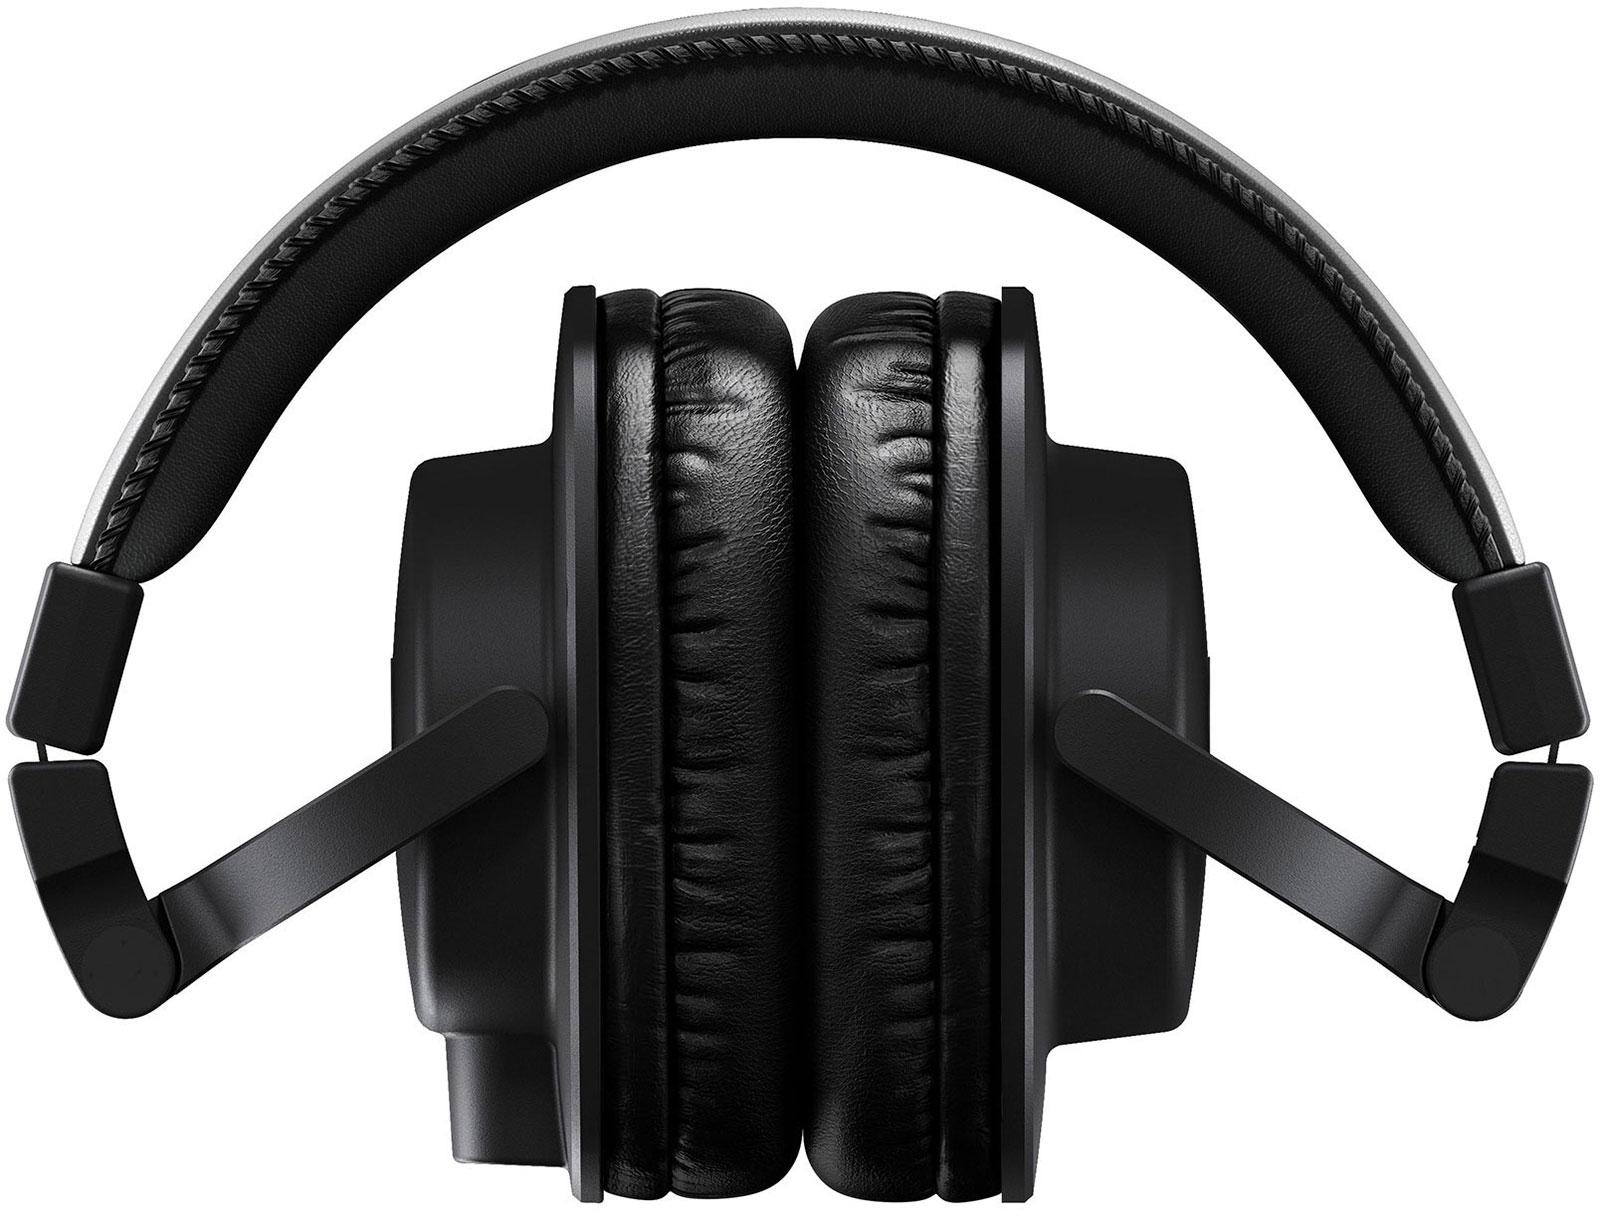 yamaha-hph-mt5-studio-monitor-headphones.jpg